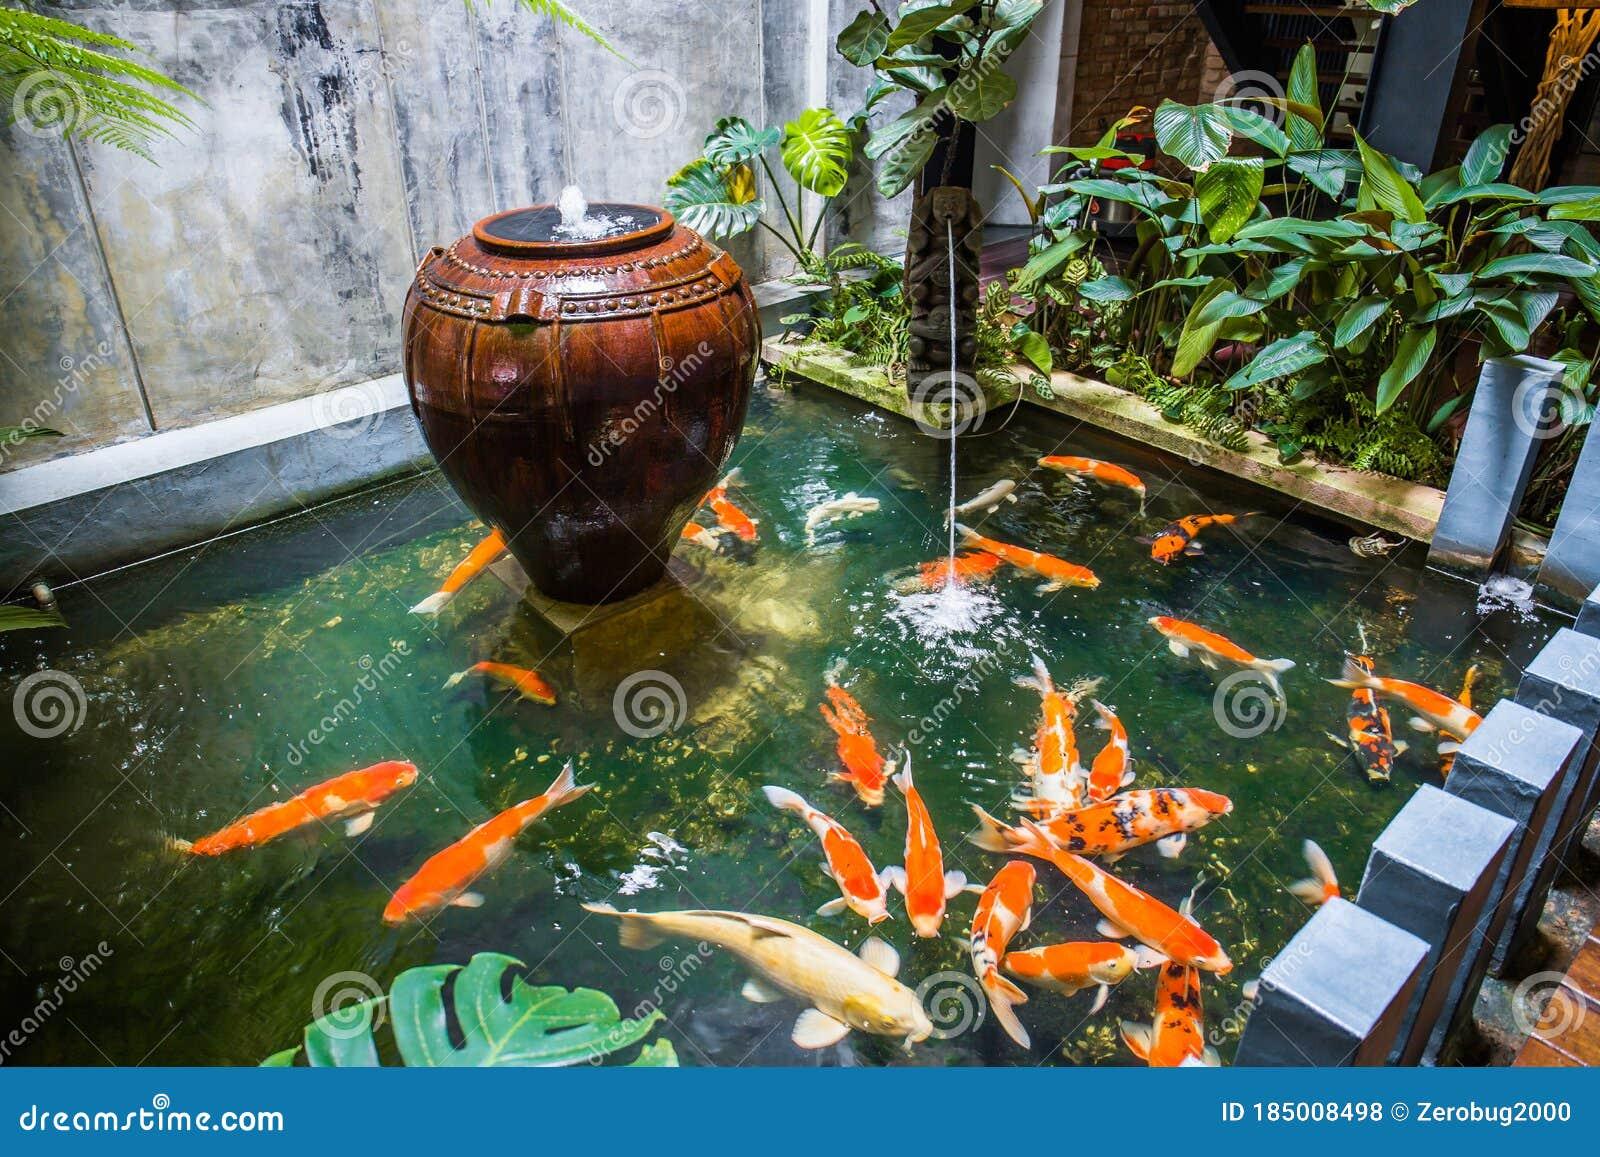 Fish Pond Stock Photo Image Of Malacca 1825 Pond 185008498